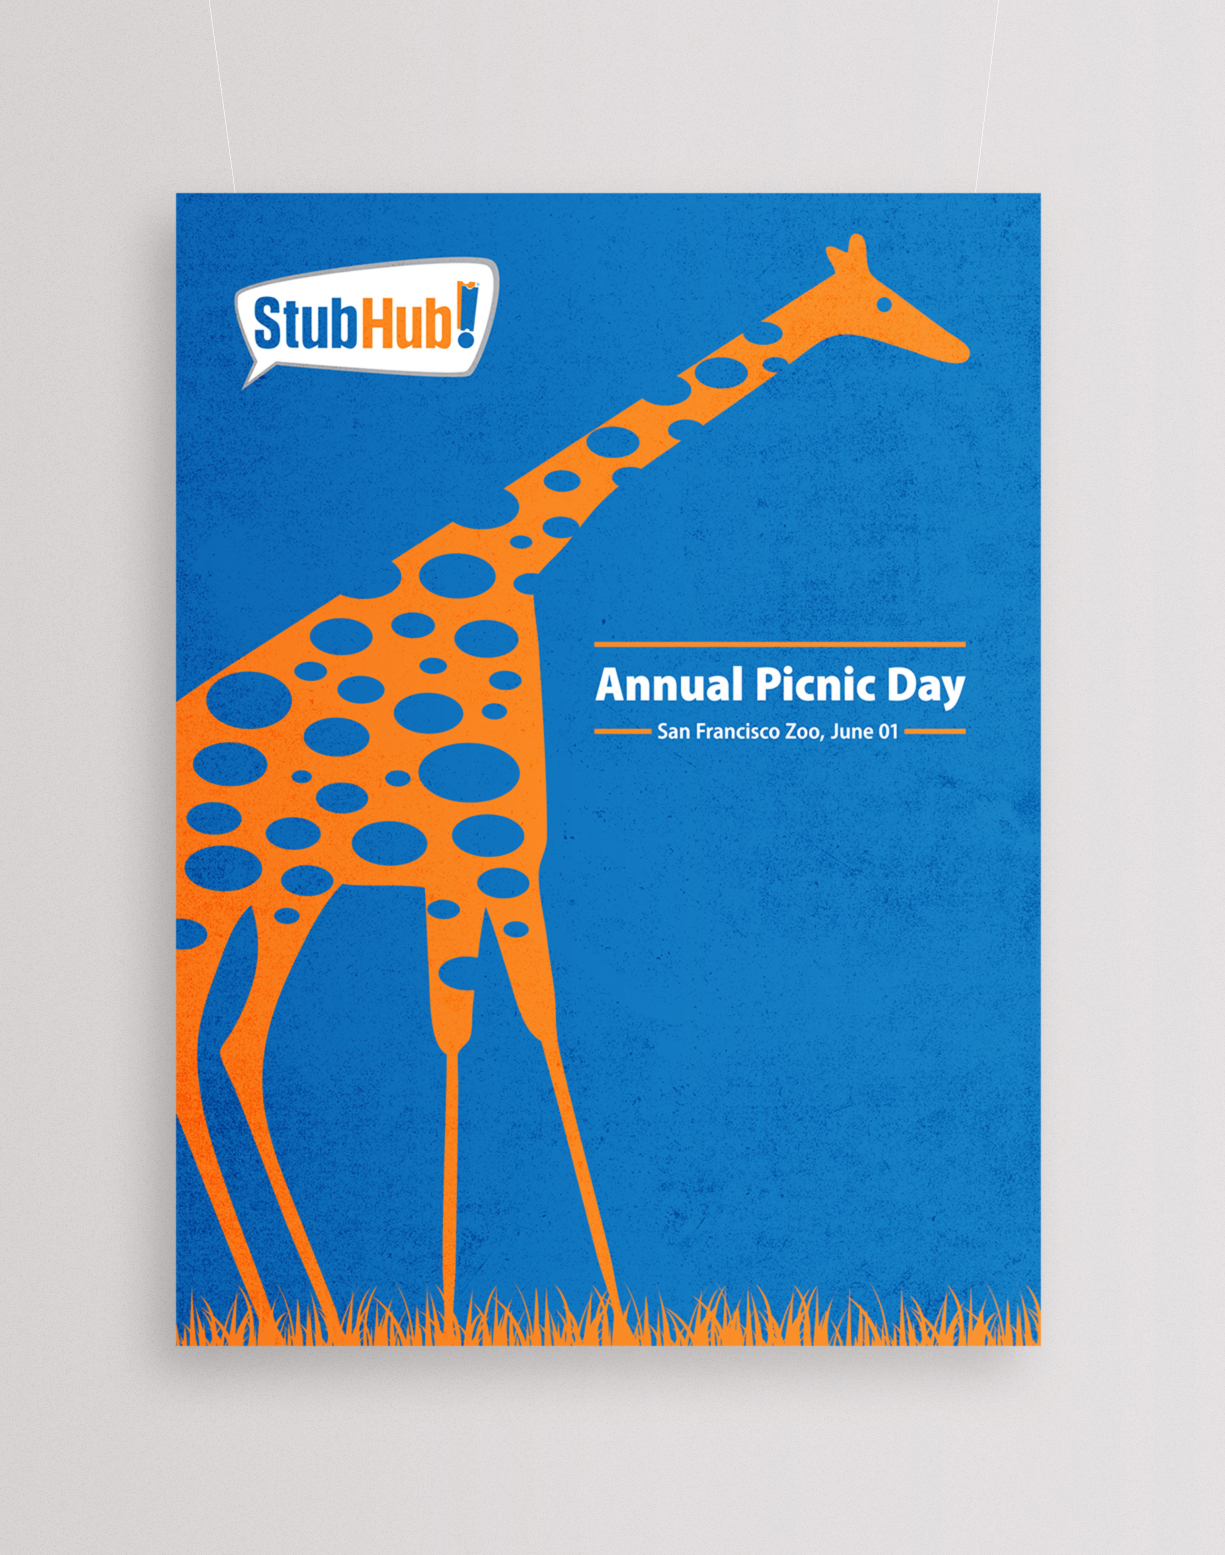 stubhub_Picnic-Day_Poster.jpg